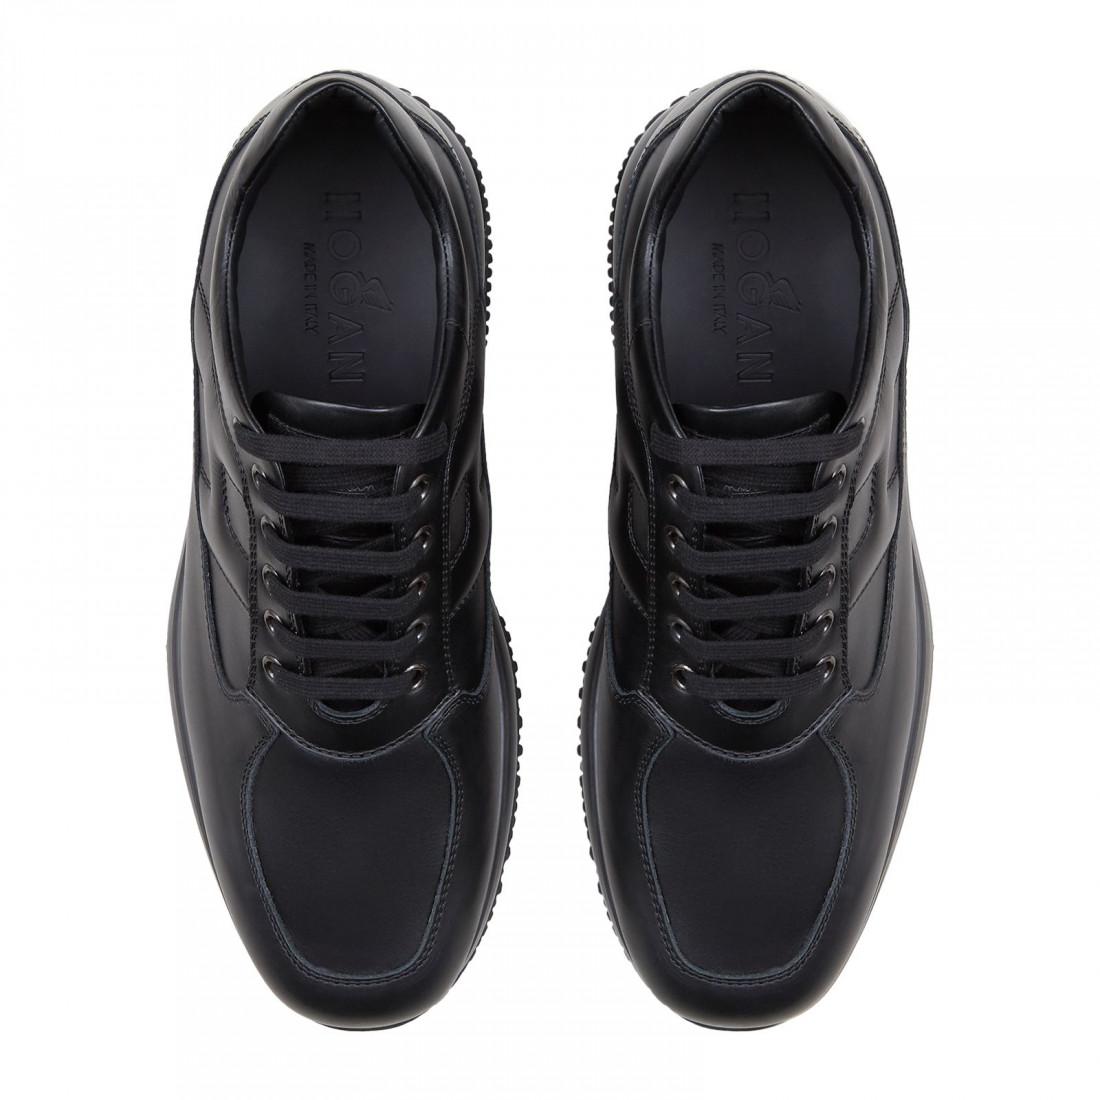 sneakers herren hogan hxm00n00010klab999 4979